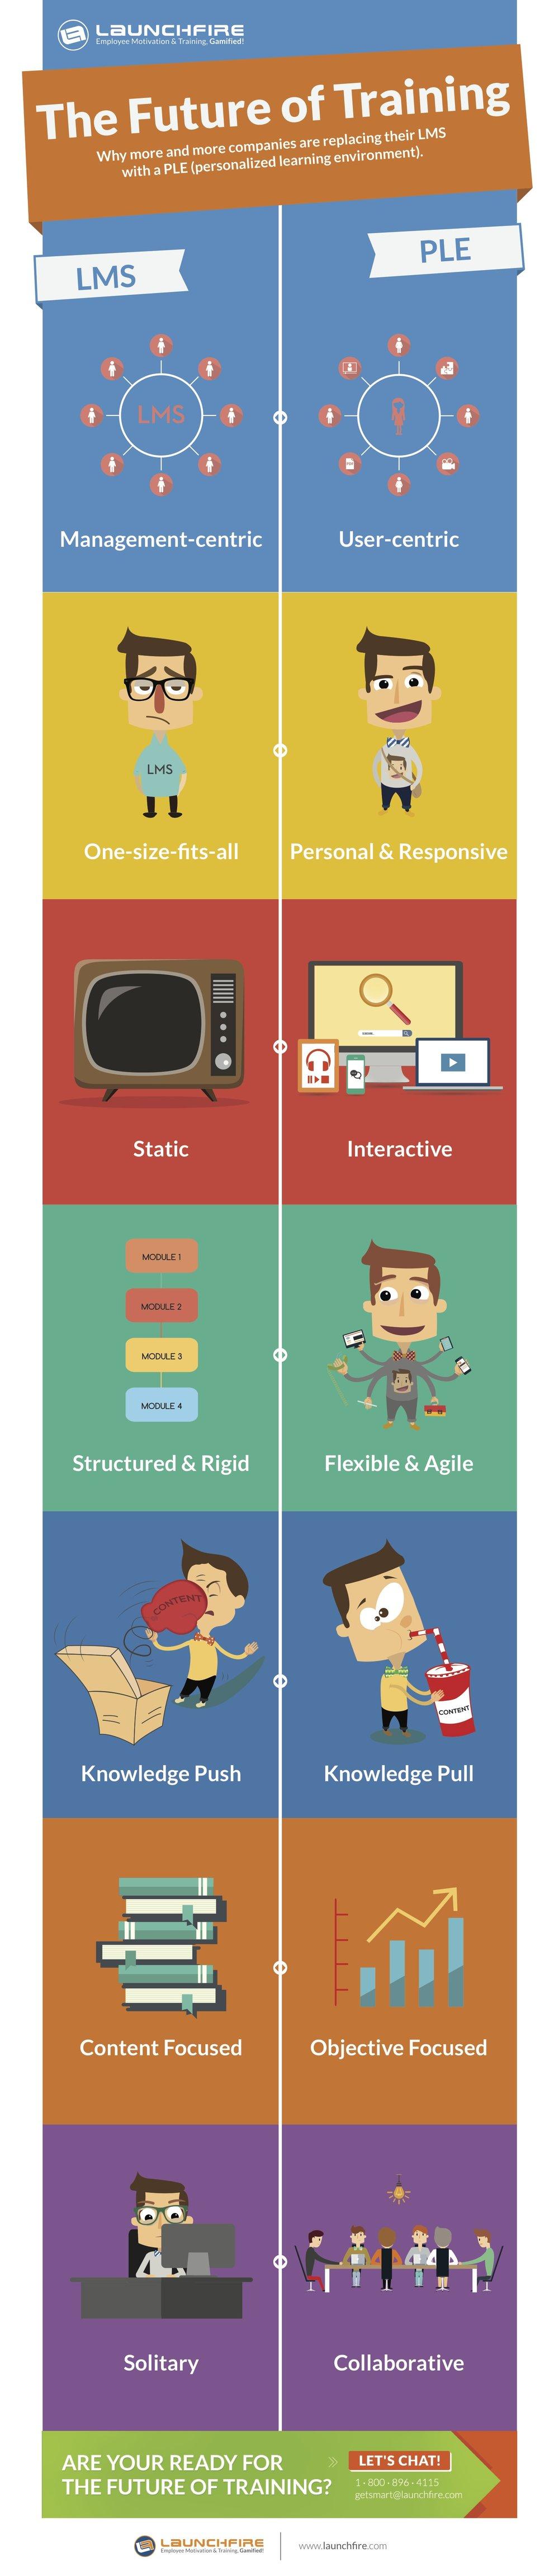 LMS vs PLE Infographic.jpg